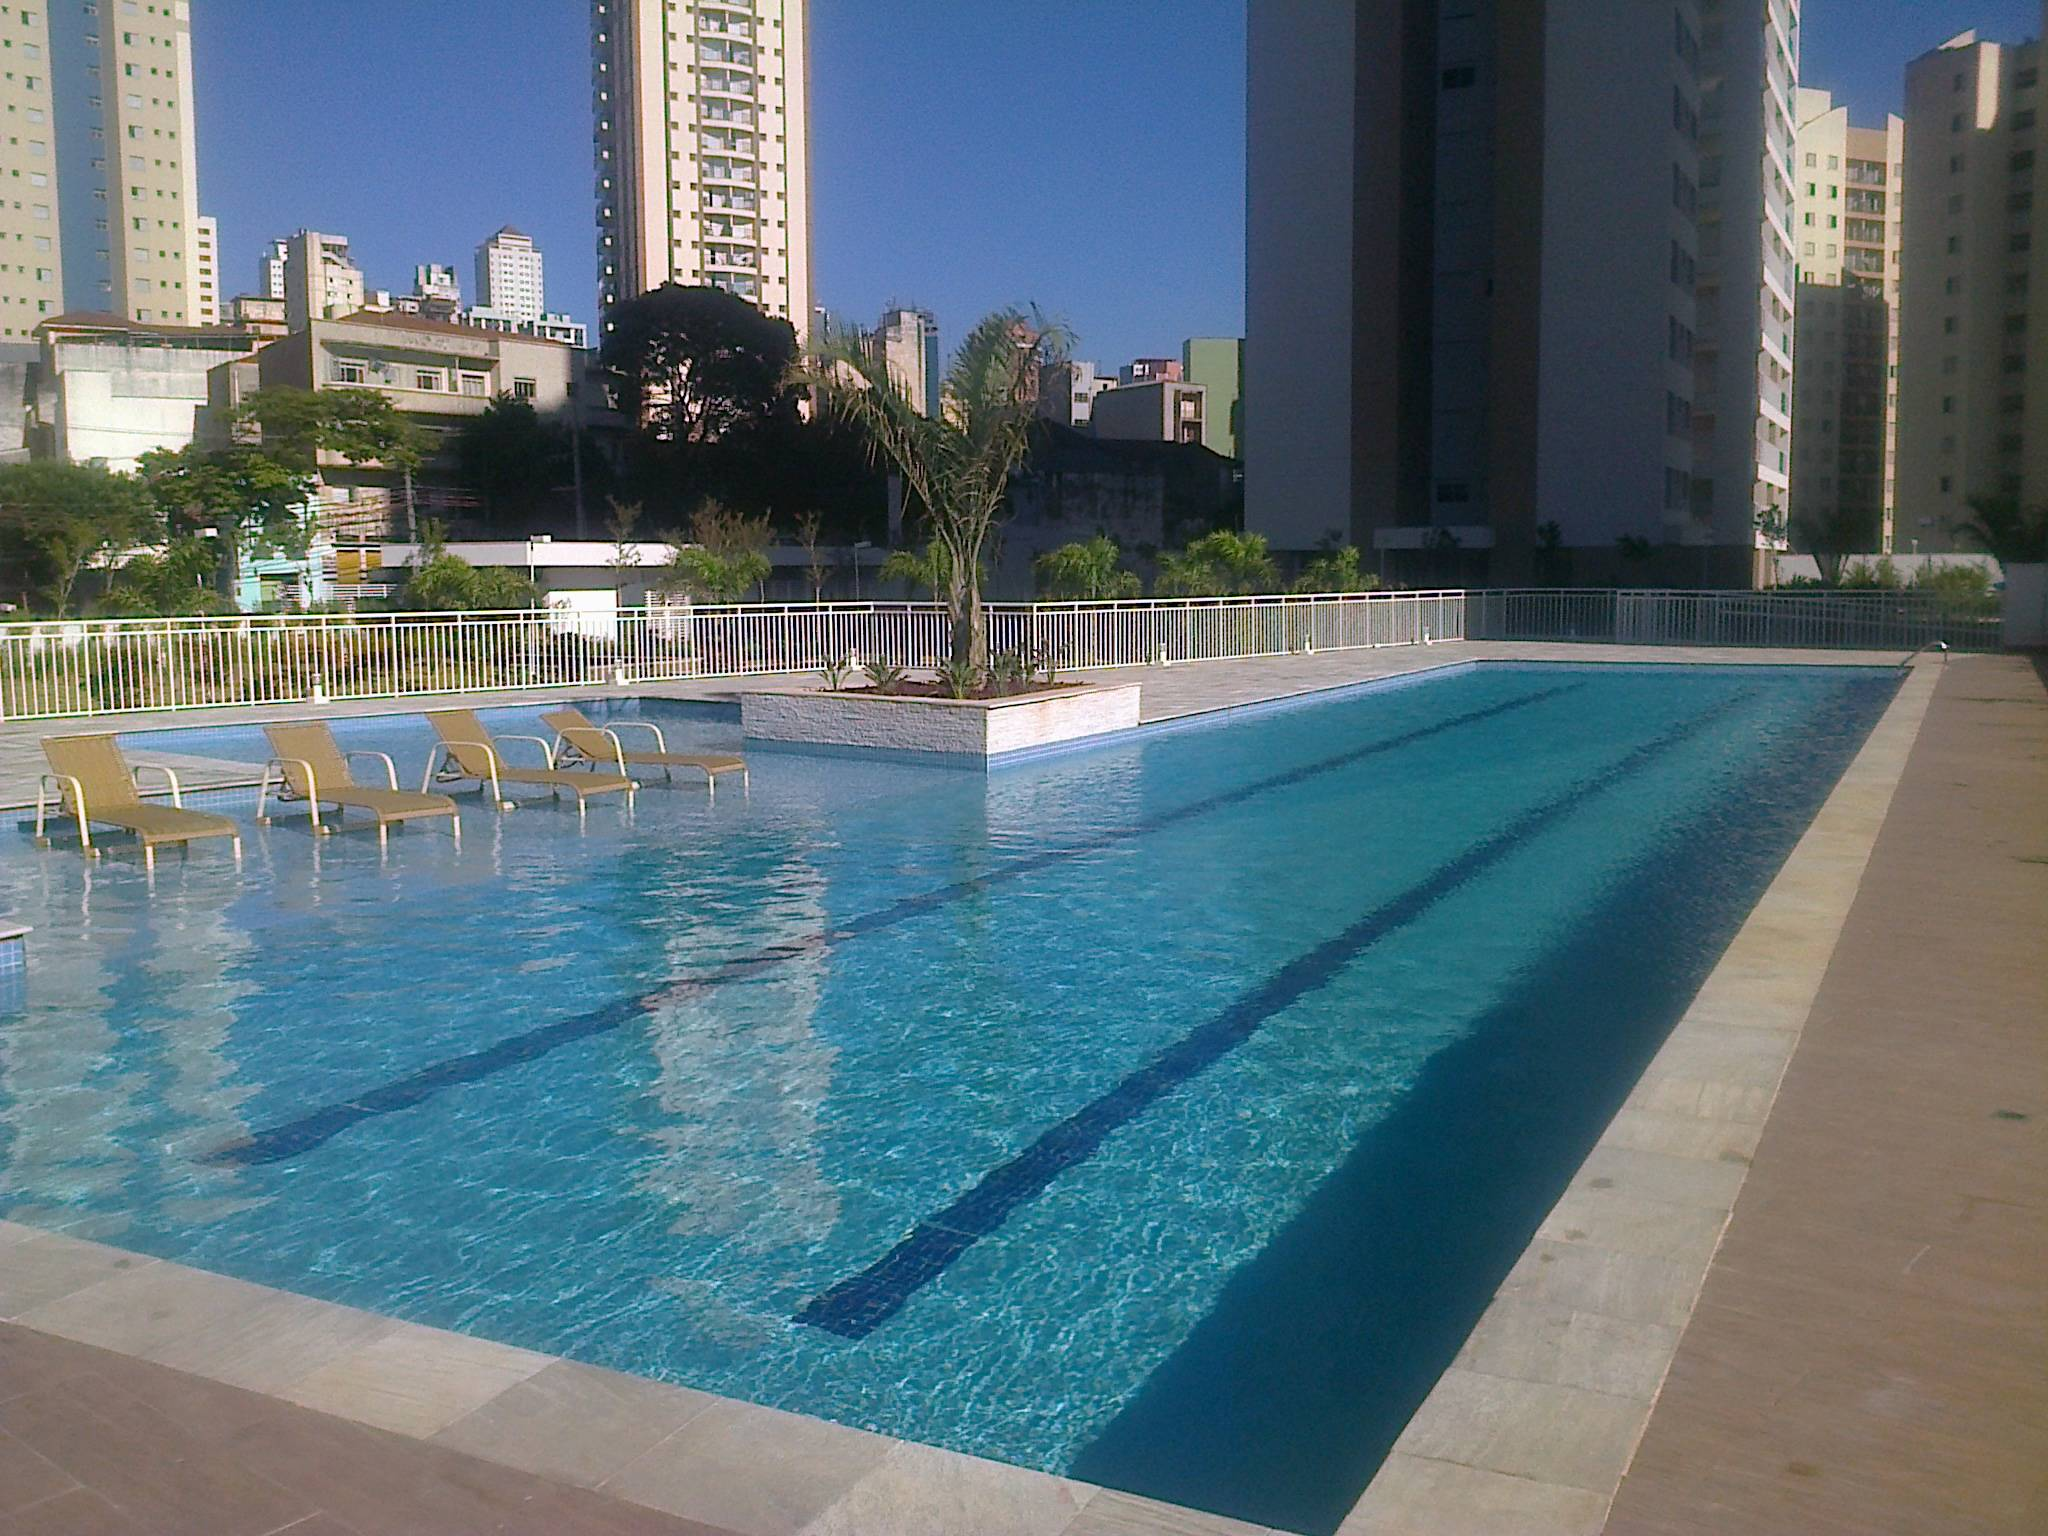 Empresas de Limpeza de Piscina na Vila Independência - Empresa para Limpar Piscina